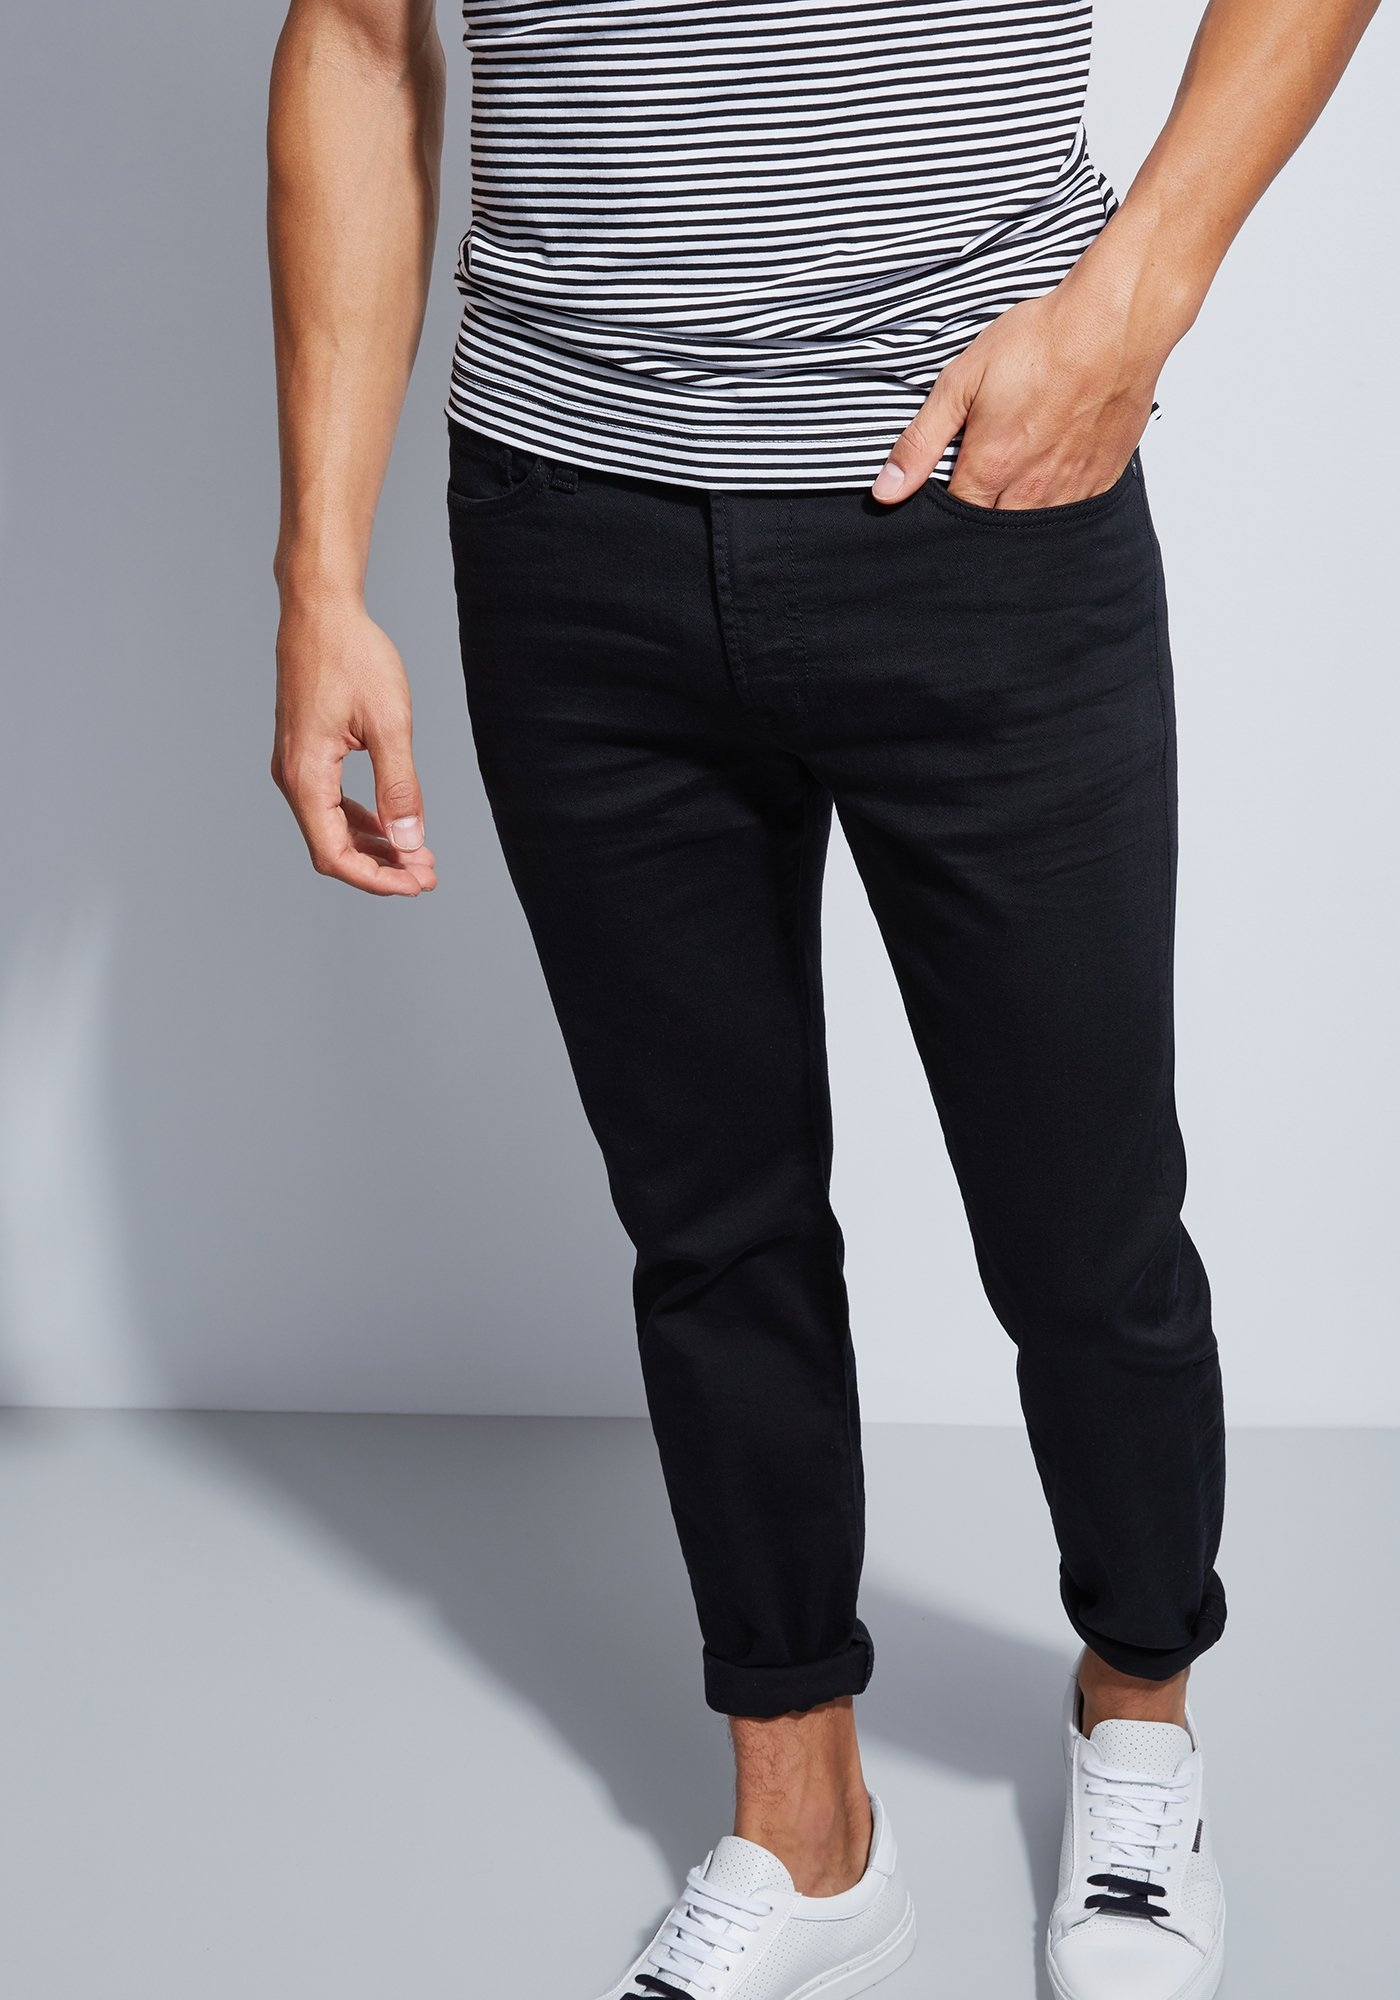 Otto Kern Pure Dynamic Stretch Jeans John - Regular Fit nu online kopen bij OTTO